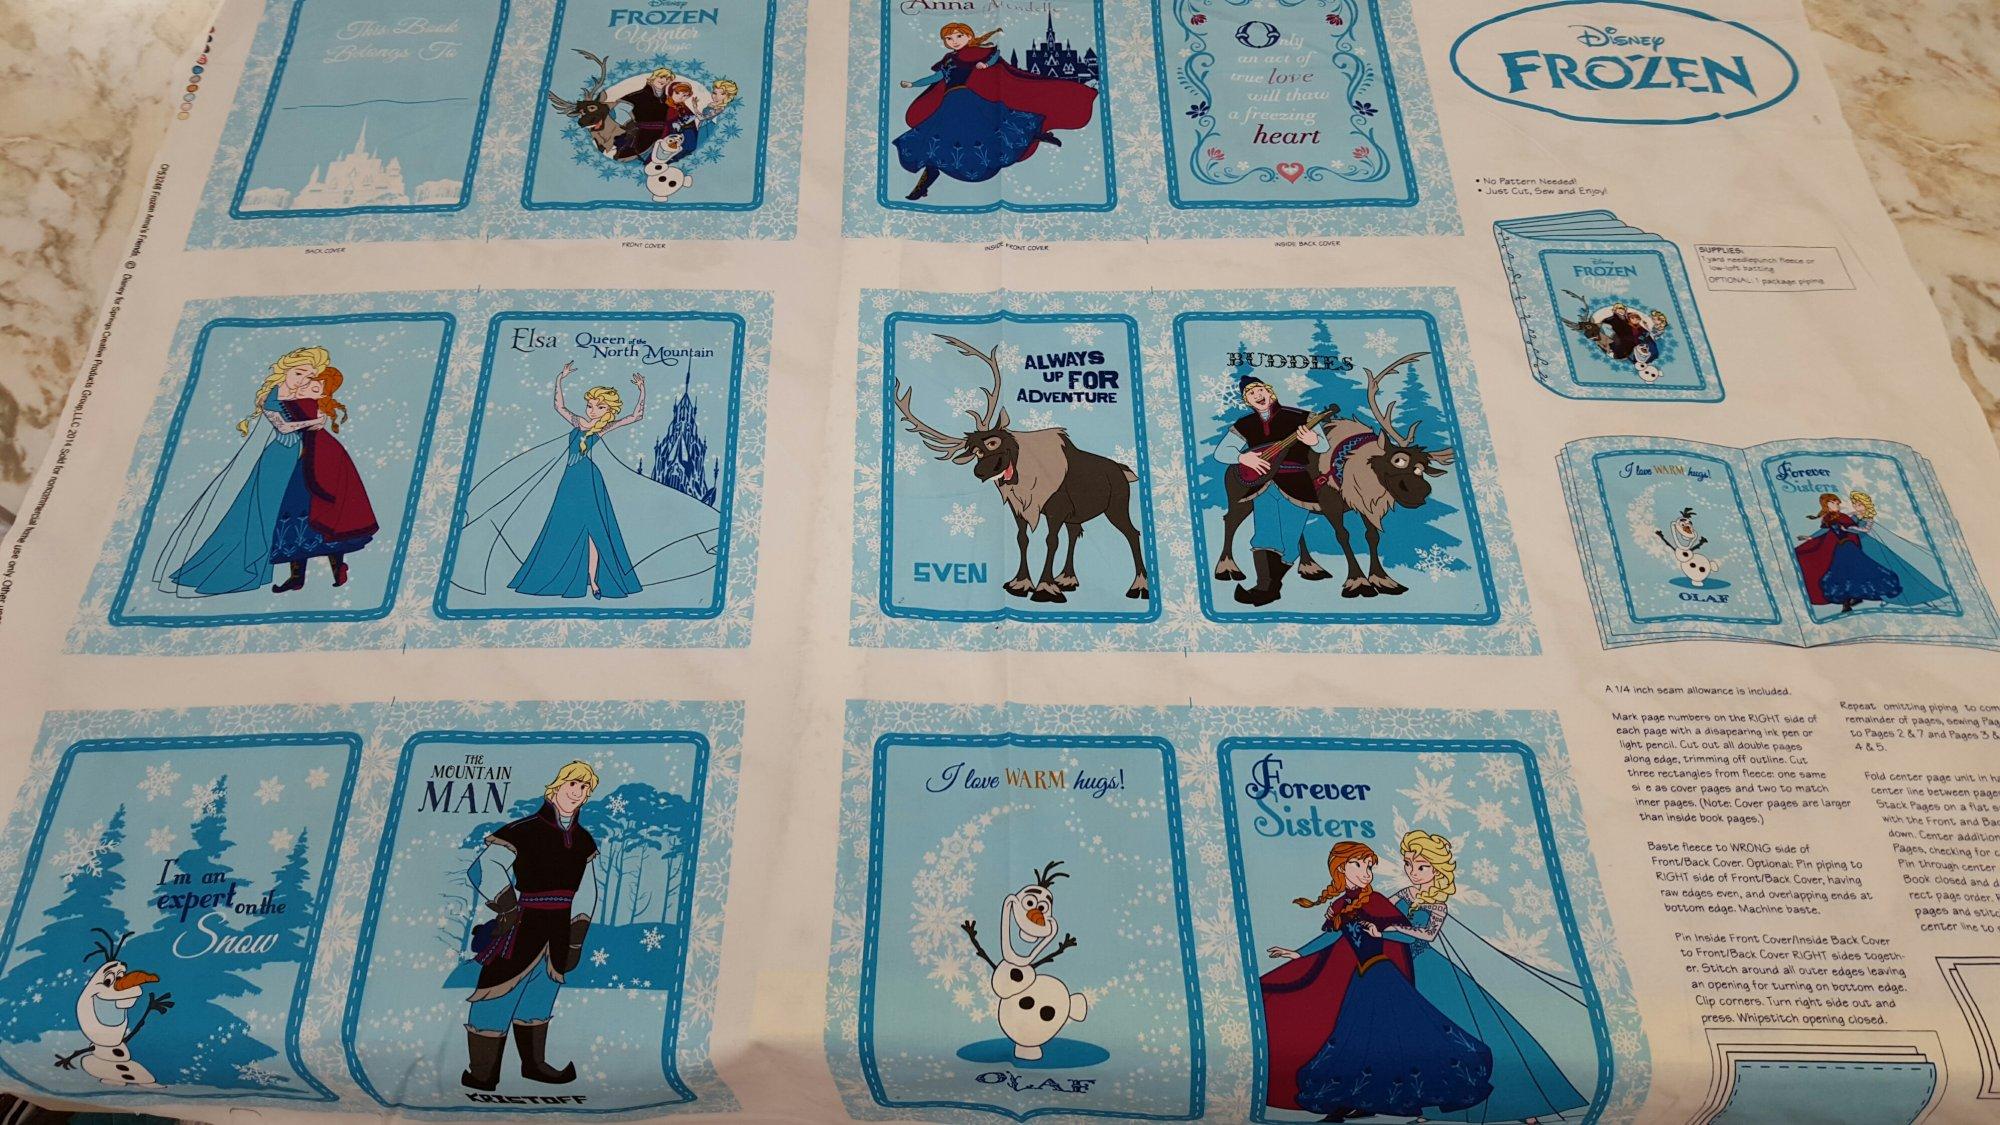 Disney Frozen Anna's Friends Book Panel